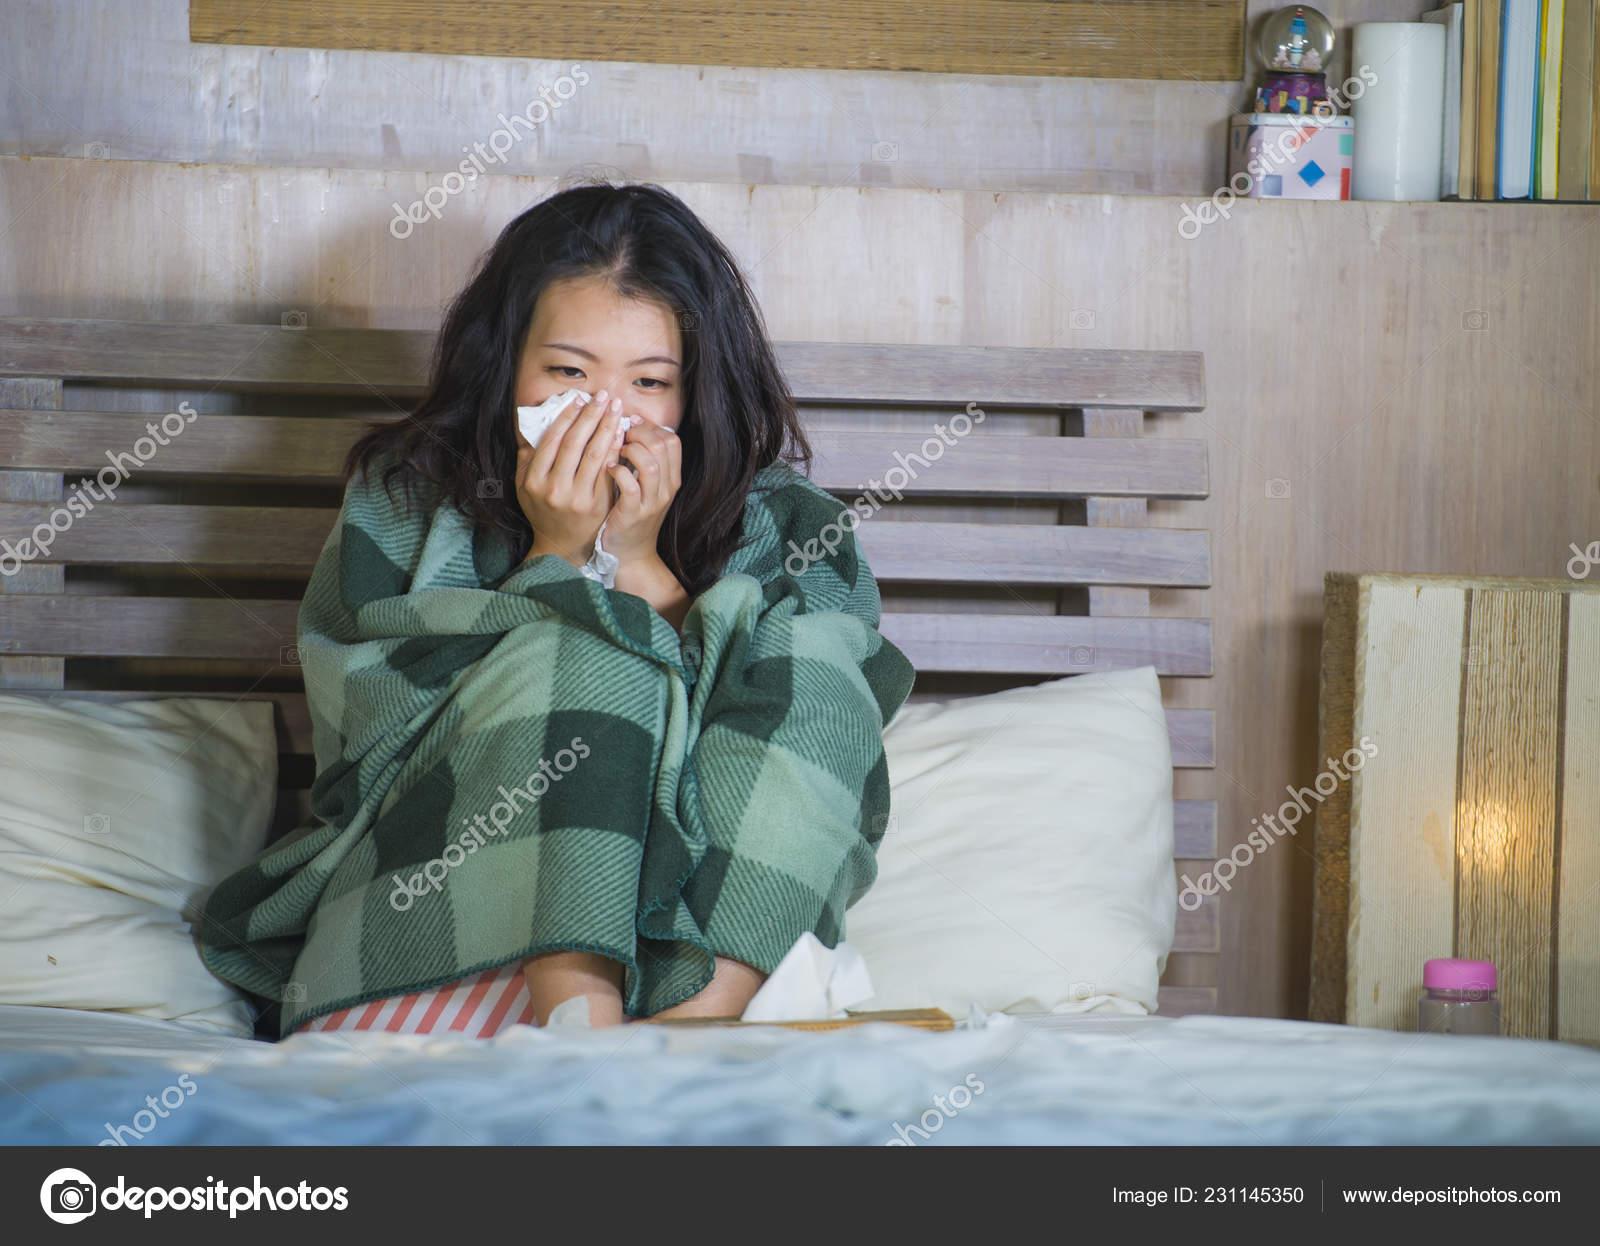 9affb42f35 Joven Coreano Asiática Hermosa Dulce Mujer Pijamas Cubierta Con Manta —  Foto de Stock